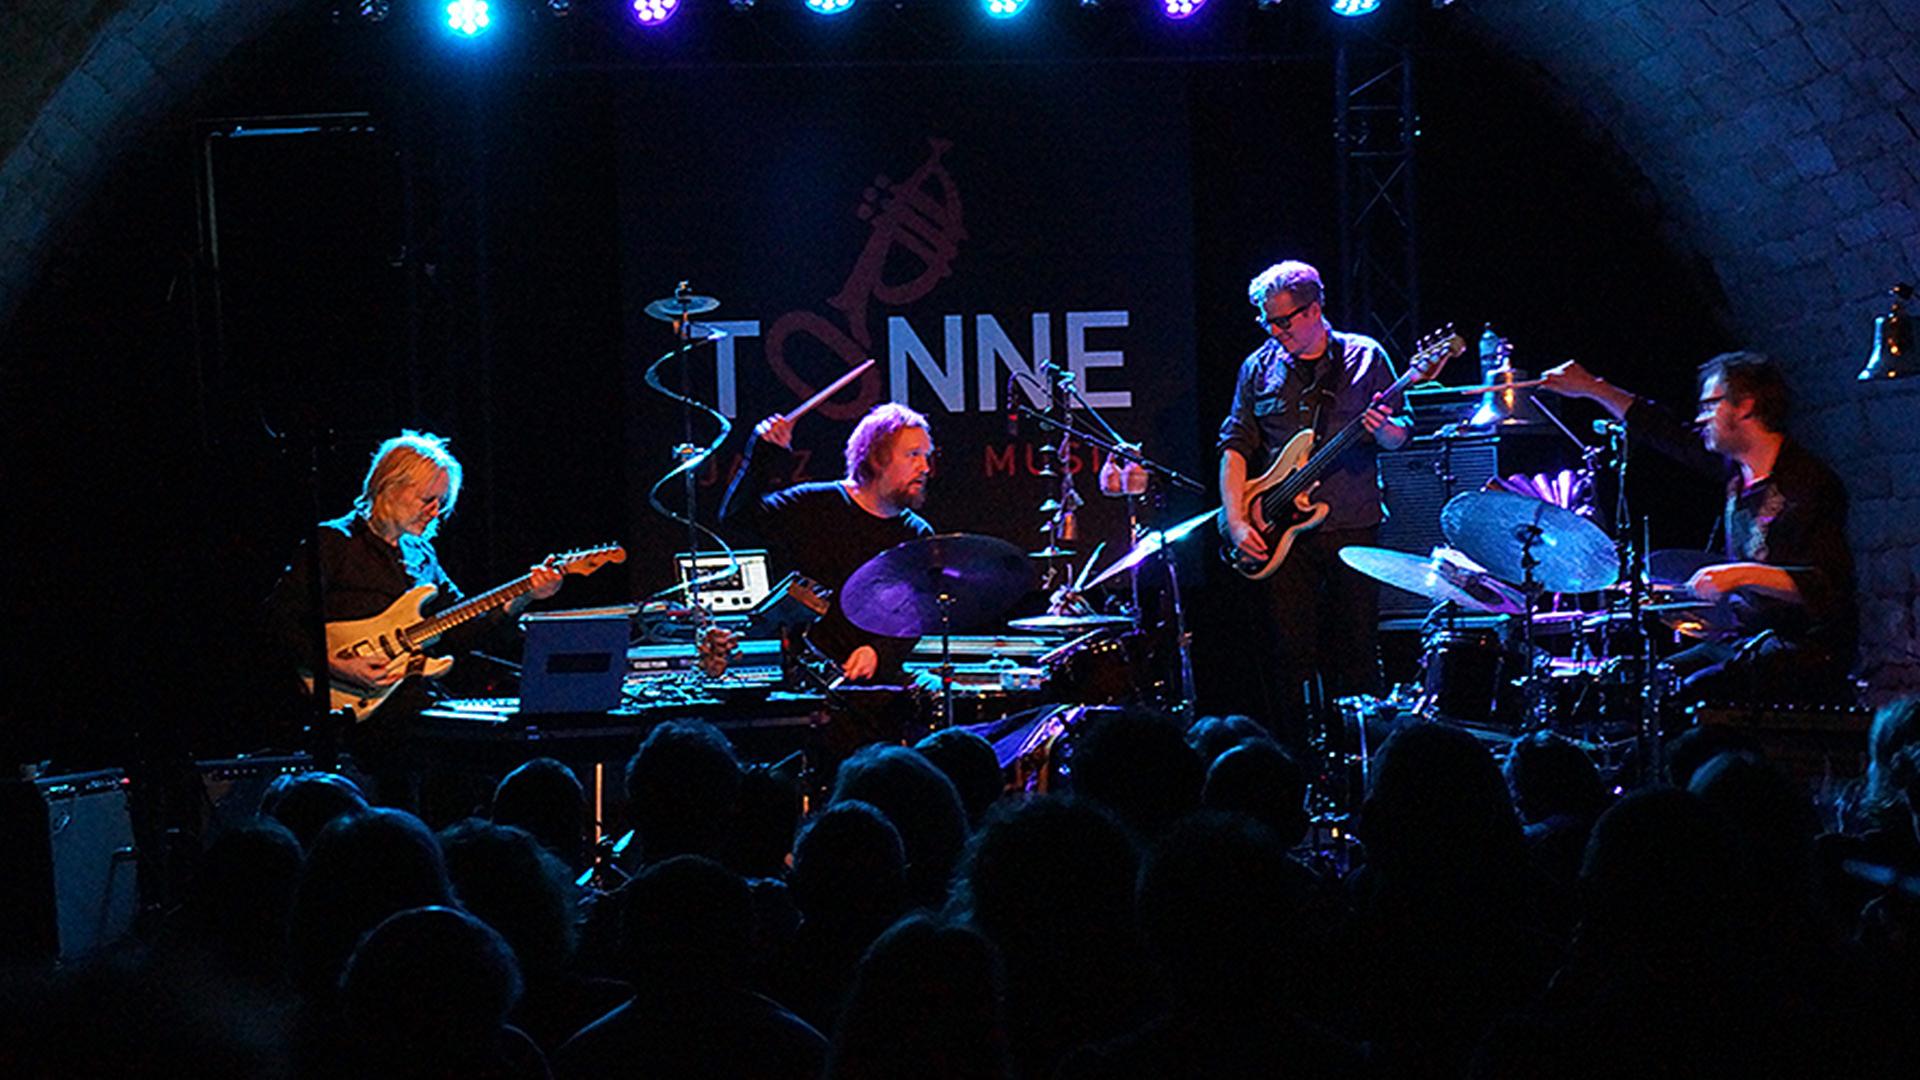 Klubnetz Dresden | Jazzclub Tonne